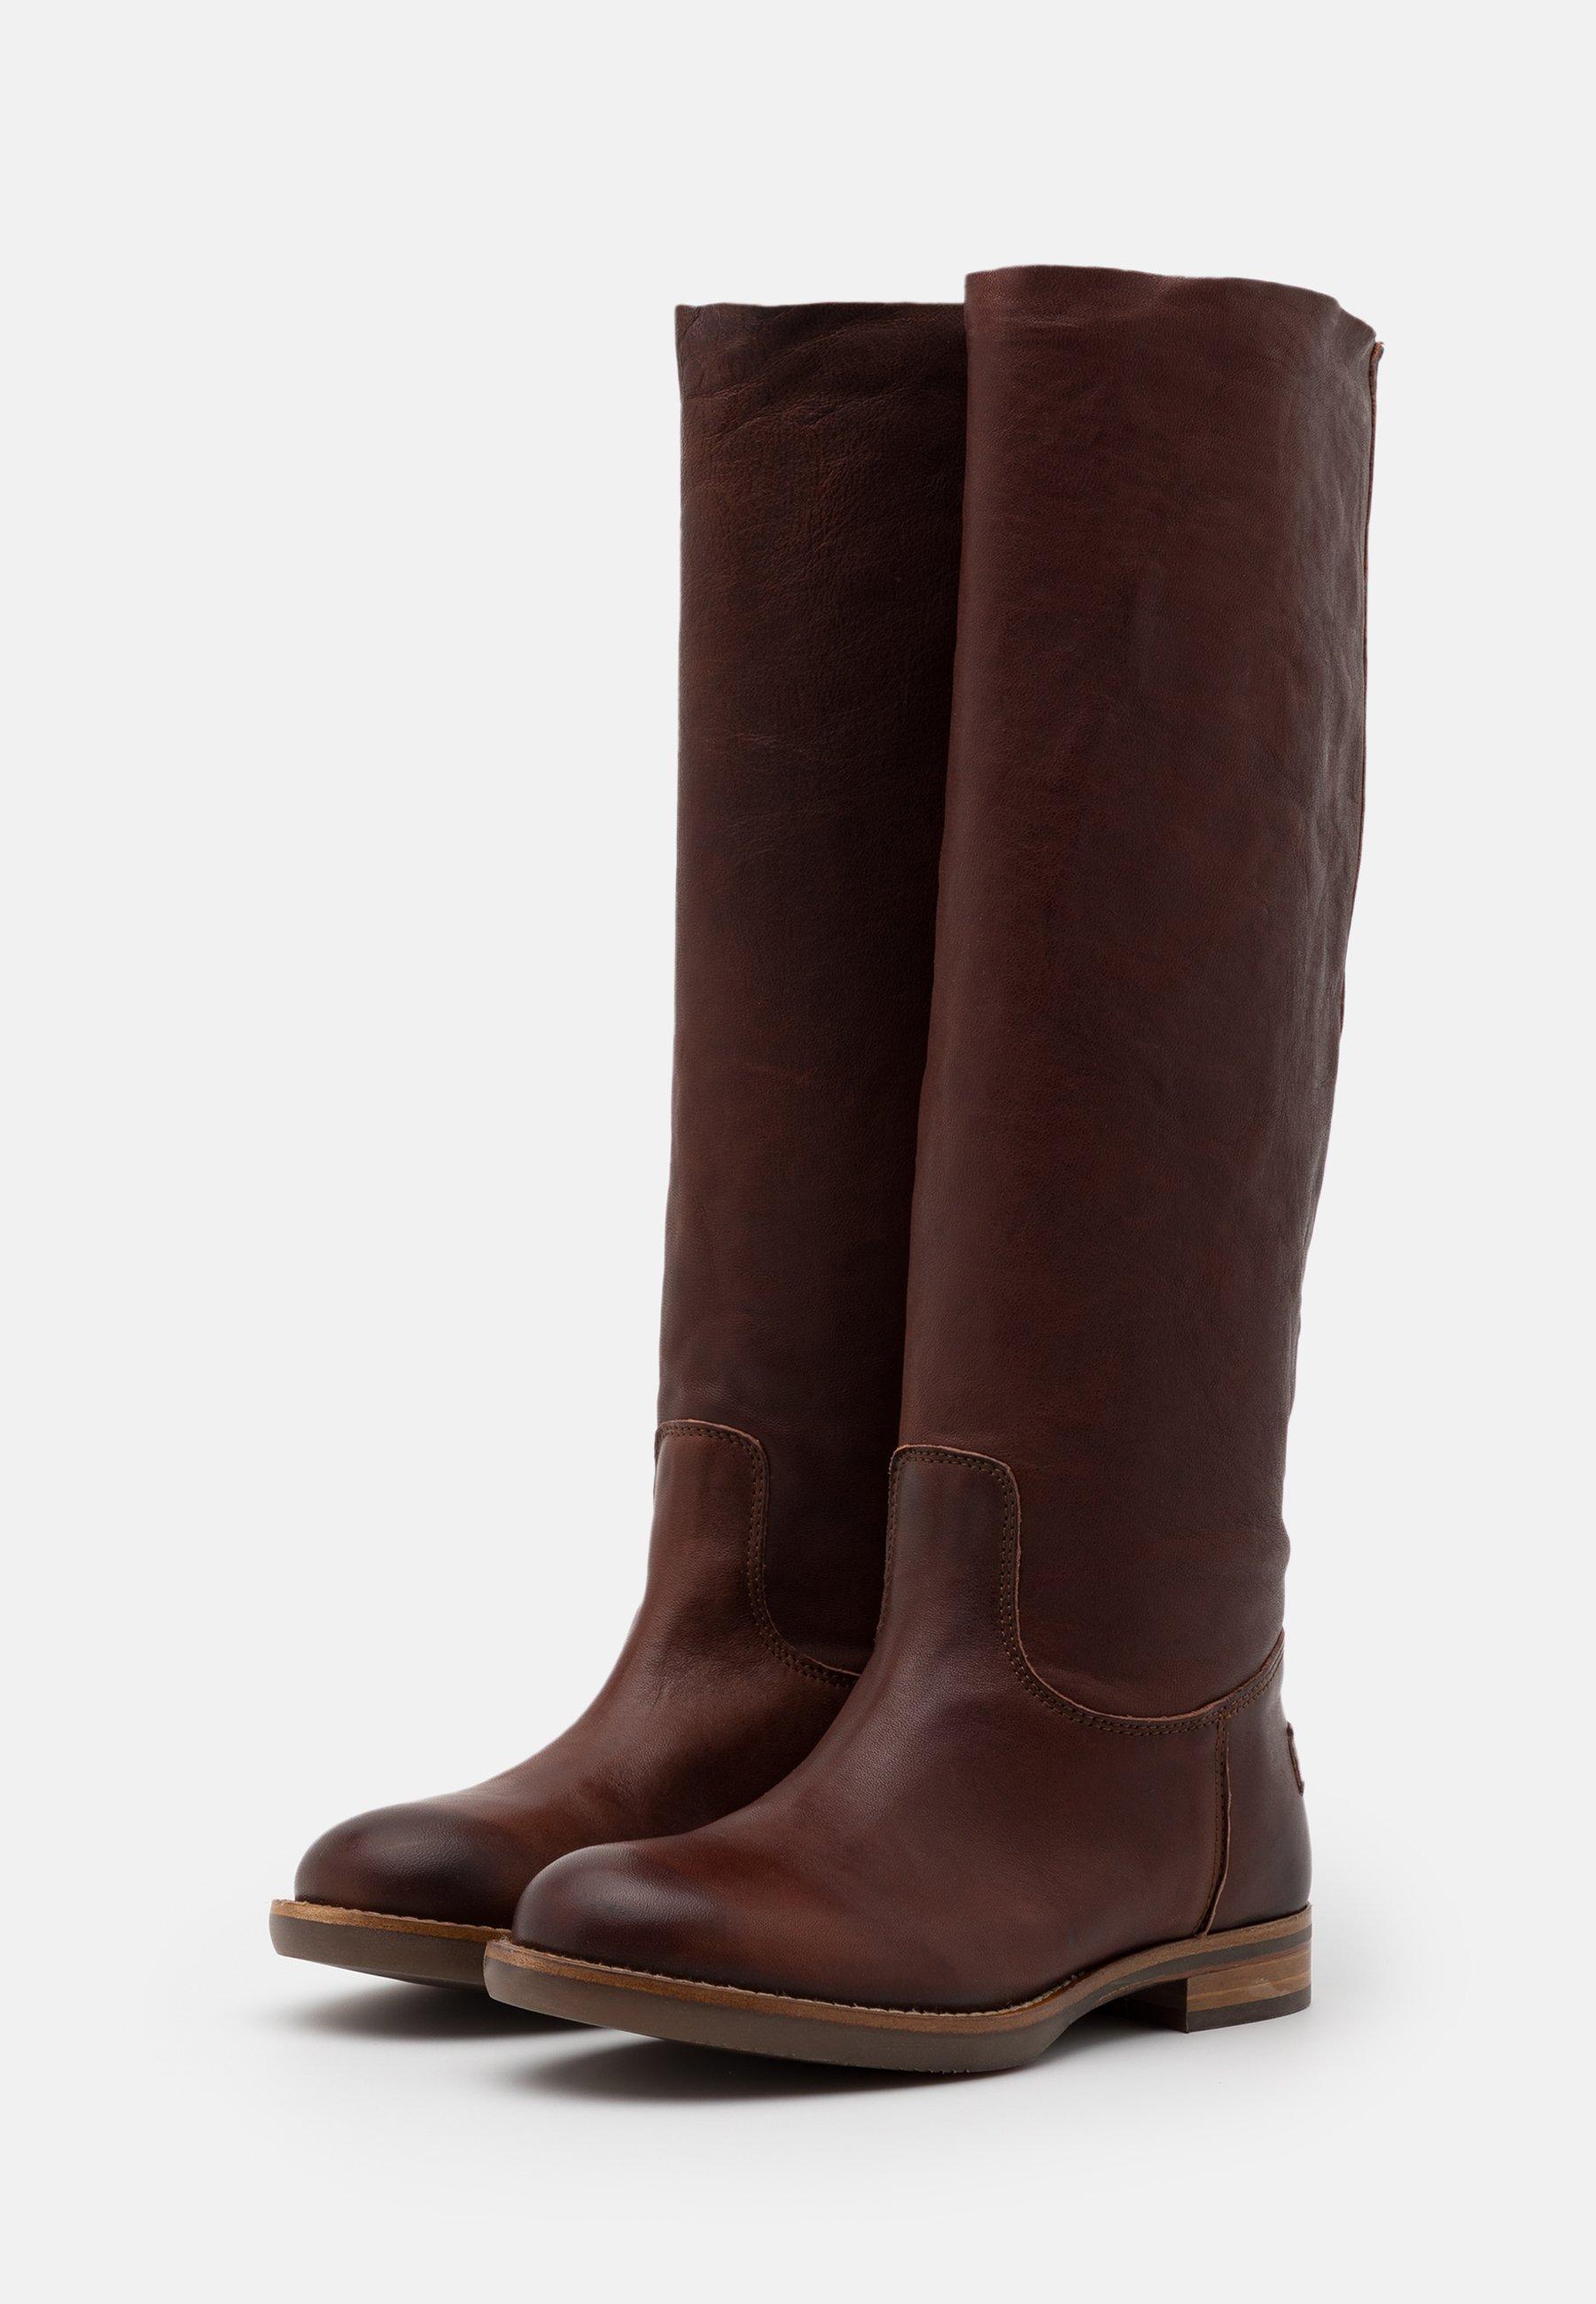 Shabbies Amsterdam Stiefel brown/braun